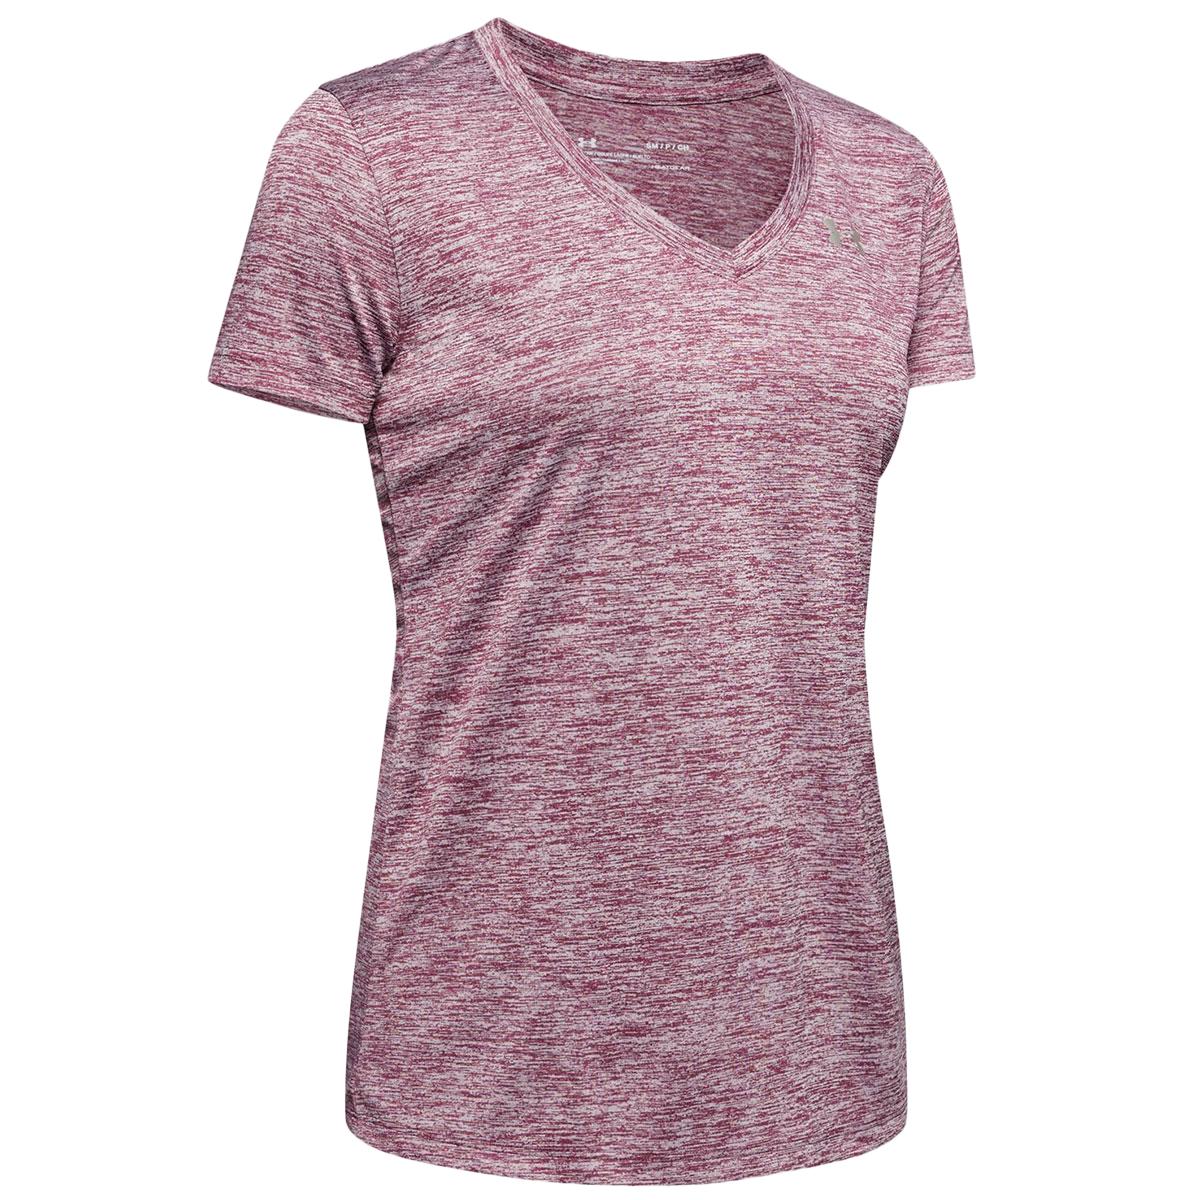 Under Armour Women's Tech Twist V-Neck Tee - Purple, S